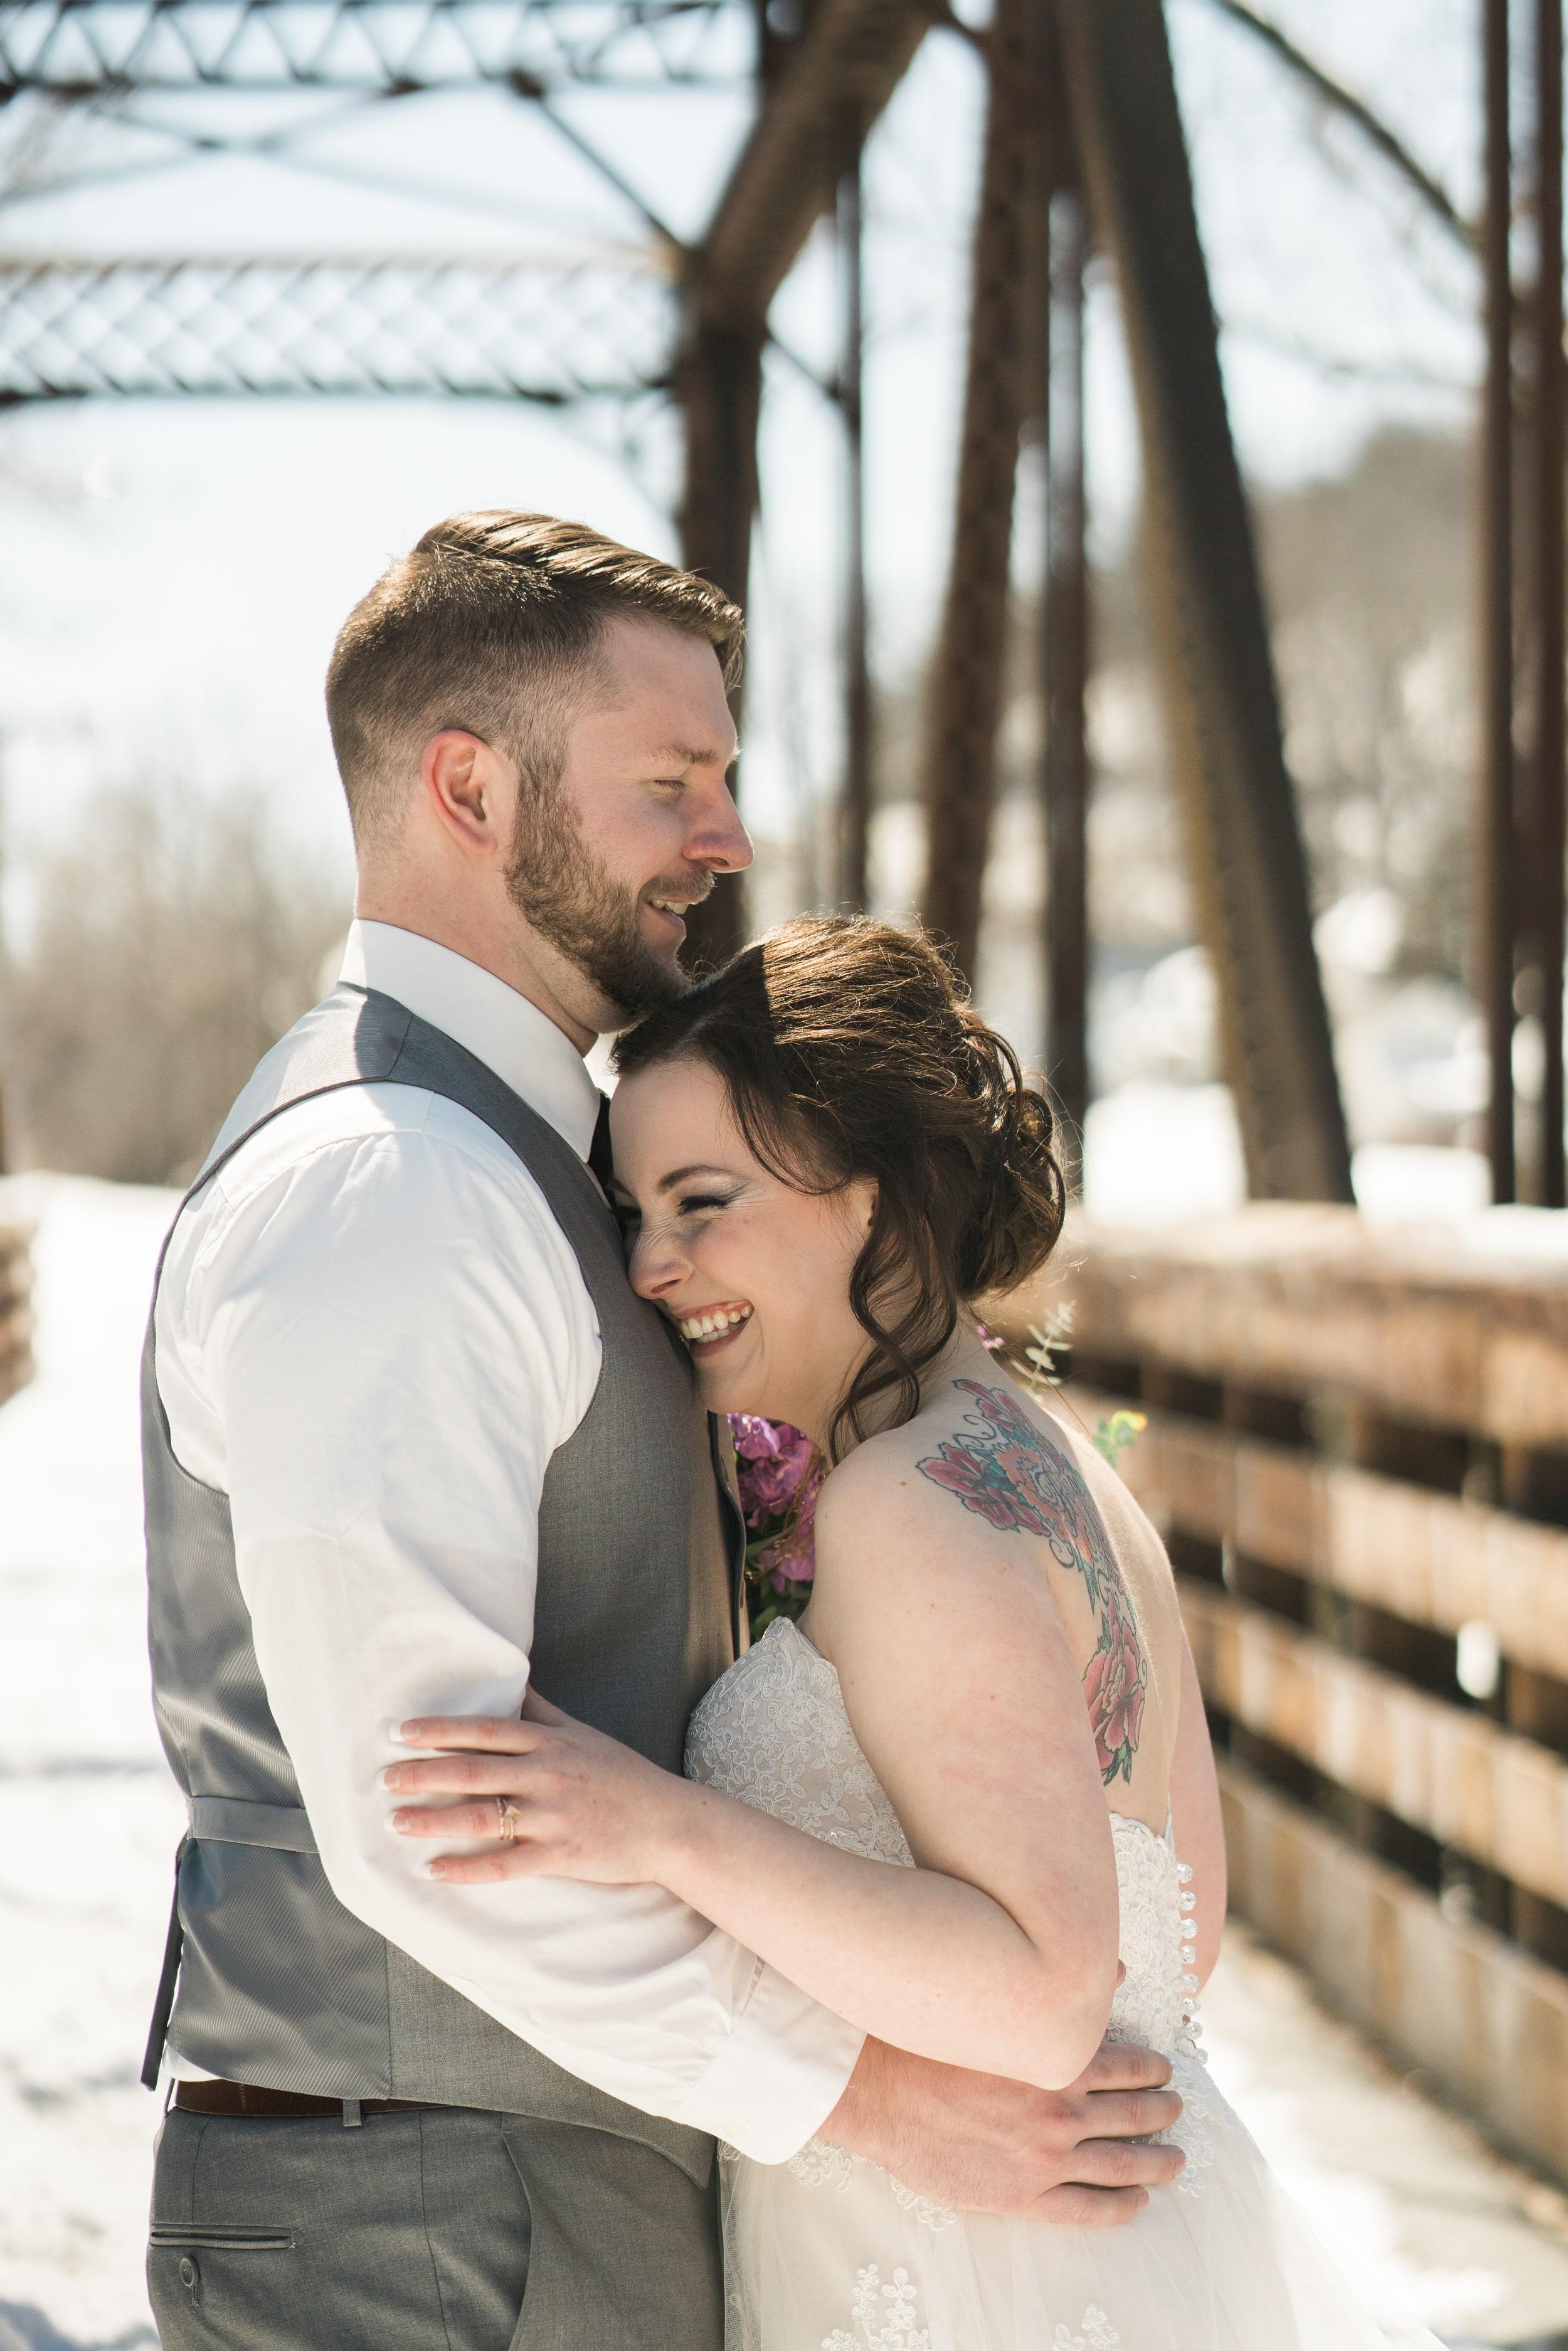 snowy-intimate-wedding-16.jpg